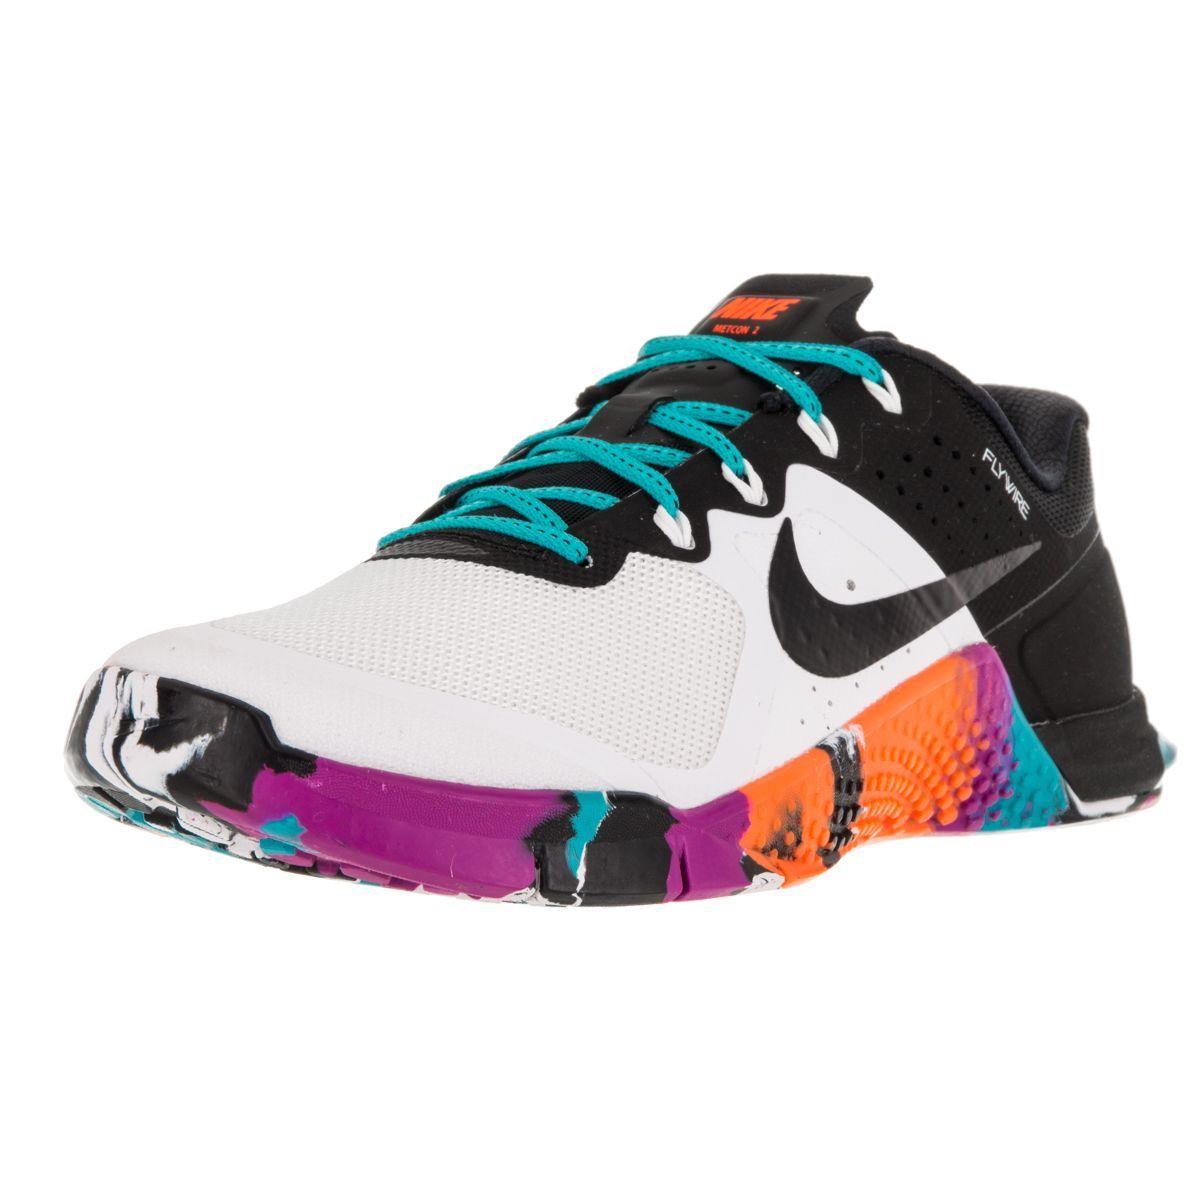 727d861a7d Nike Women's Metcon 2 /Black/Gamma Blue/ Vlt Training Shoe | my ...